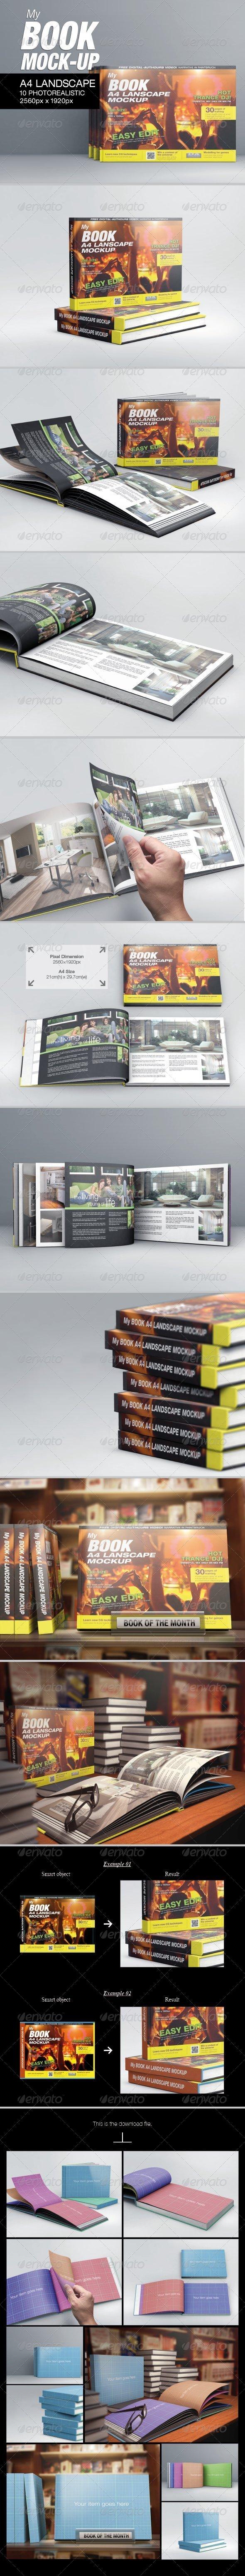 MyBook A4 Landscape Mock-Up - Books Print